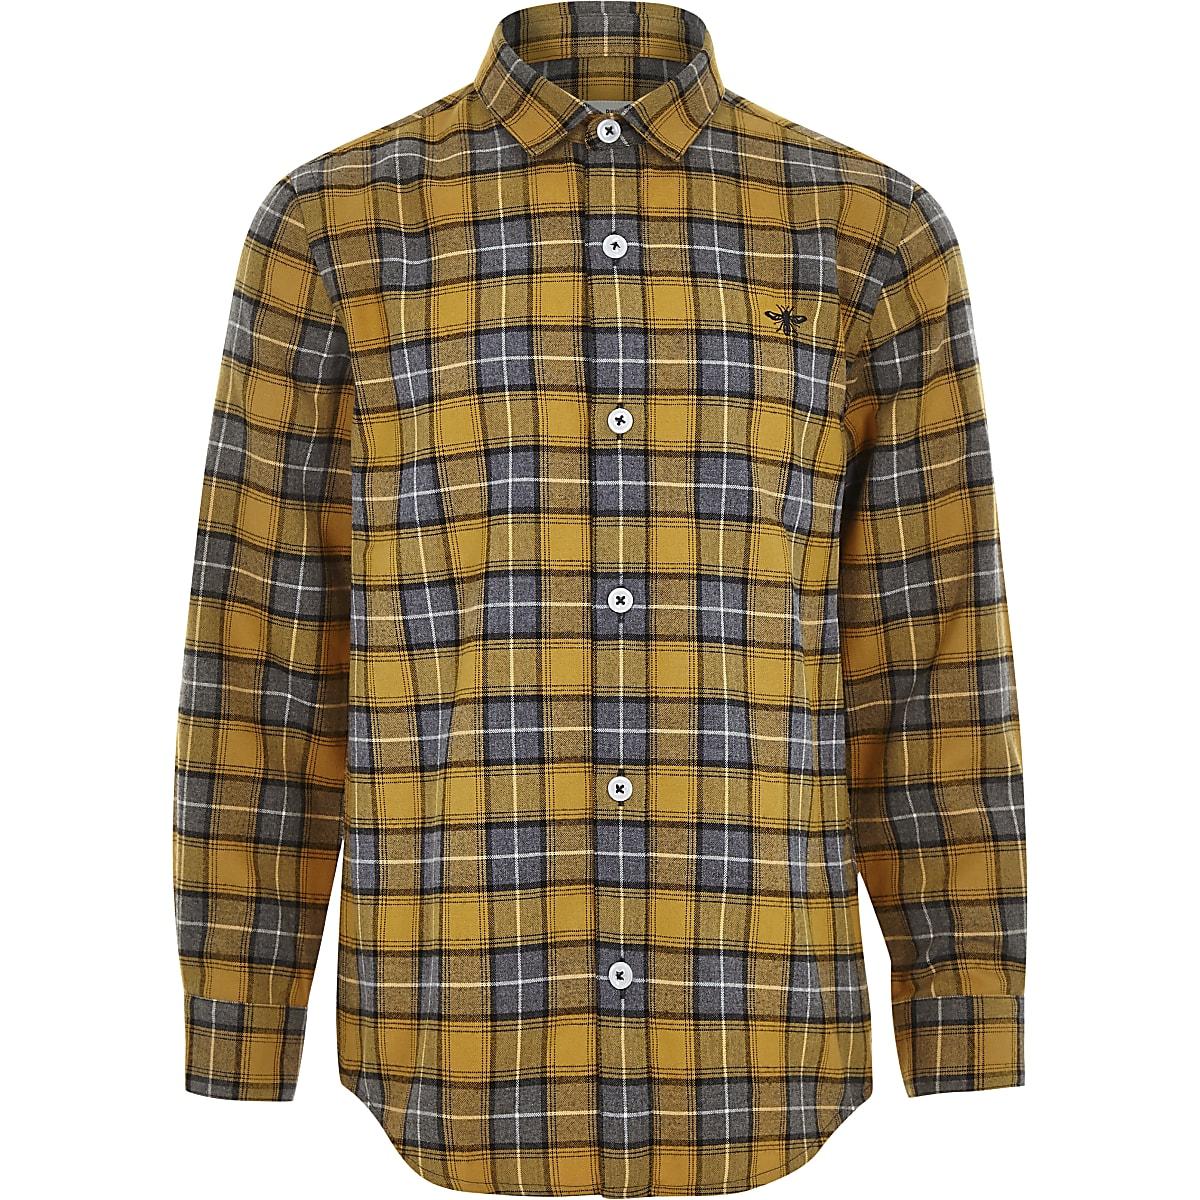 Boys yellow check button-up shirt